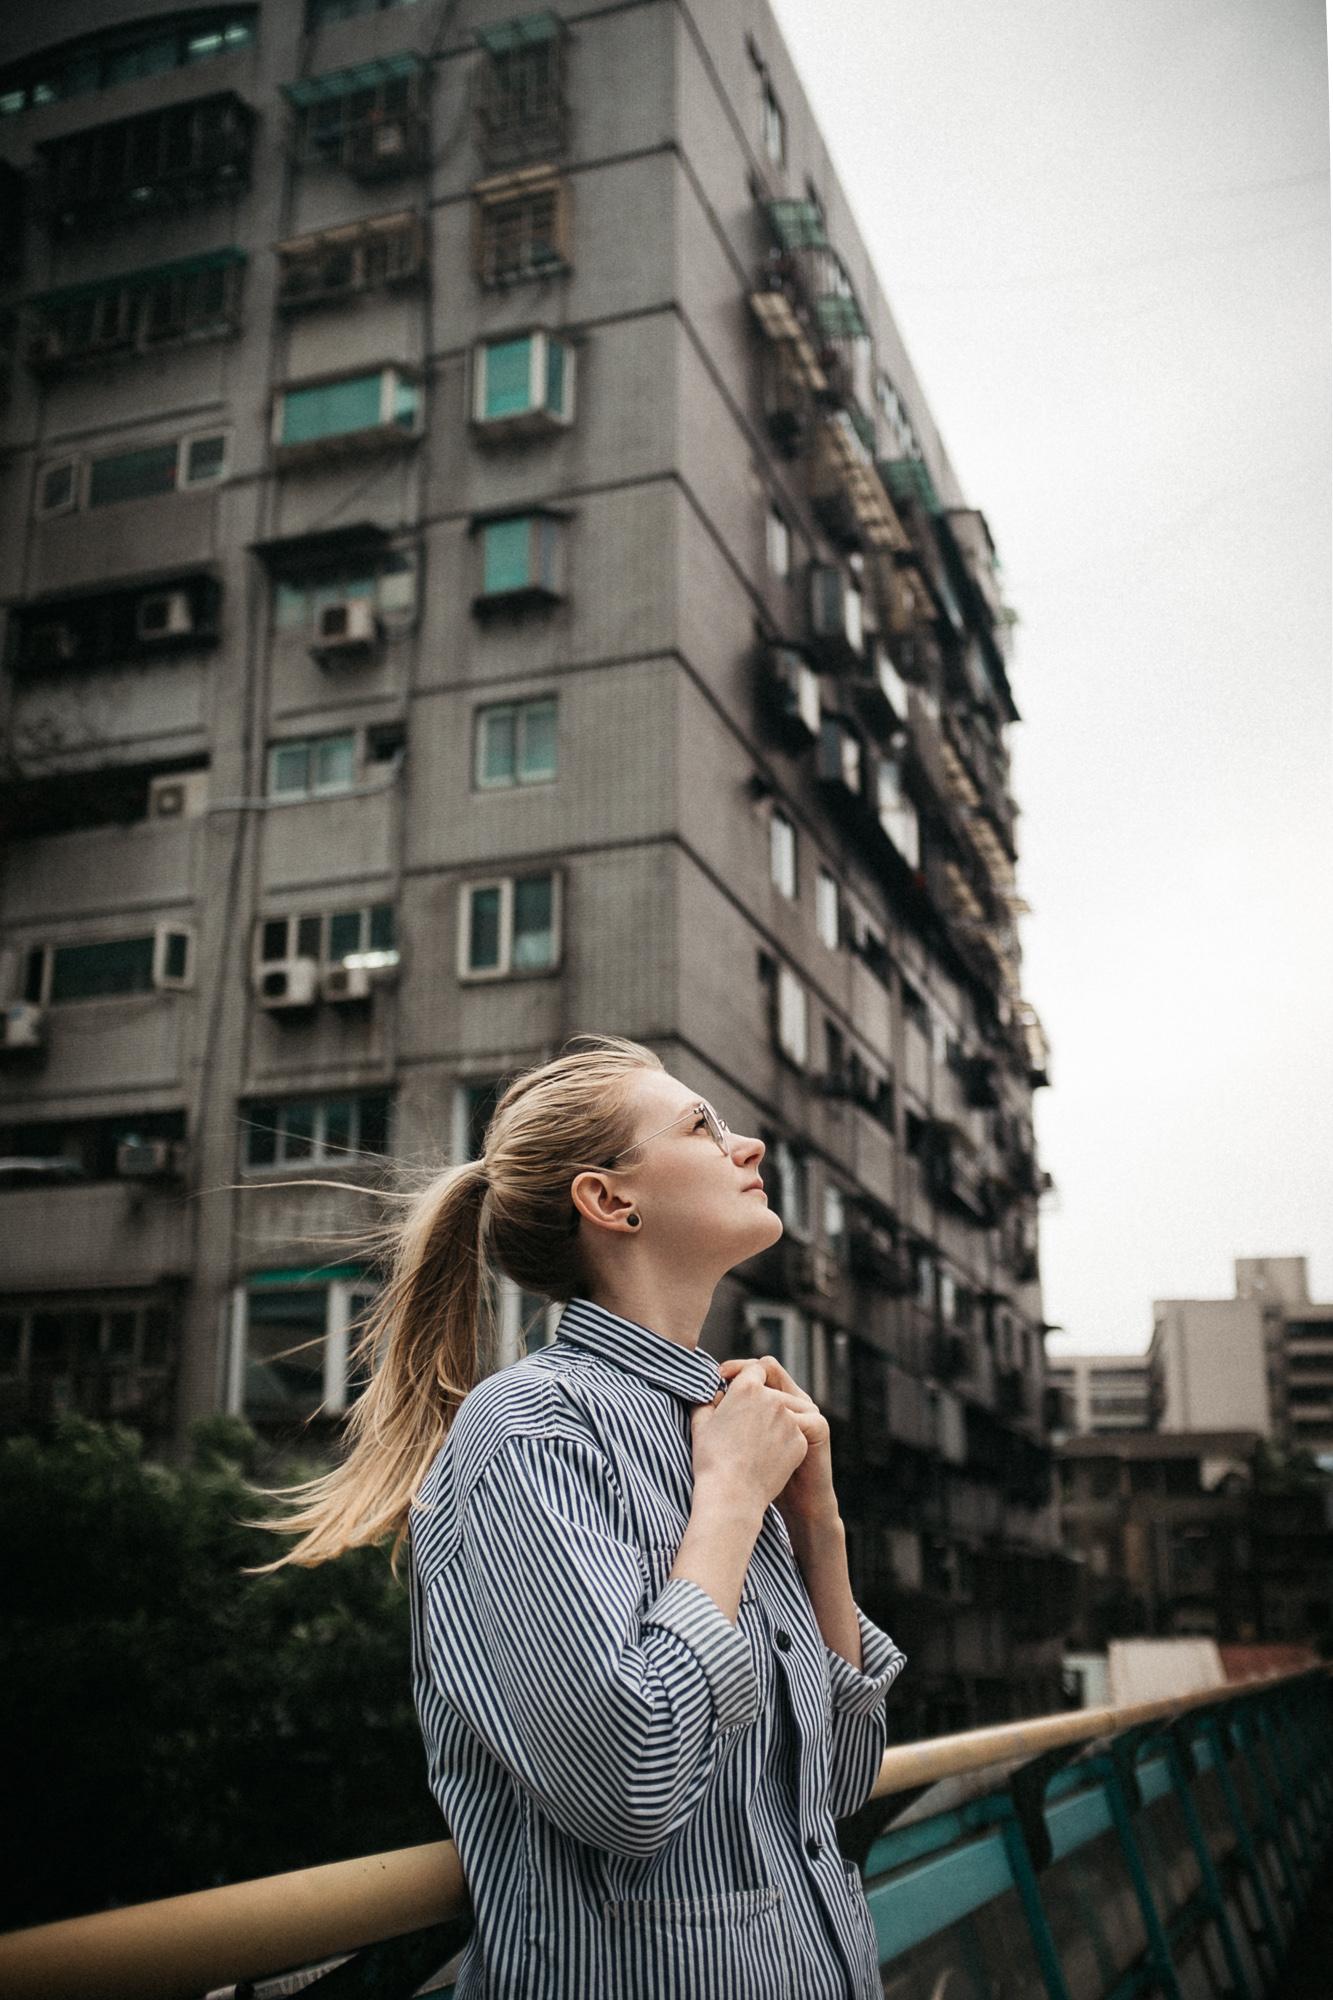 waltsmedia-portrait-taiwan-taipeh-travel-reise-10